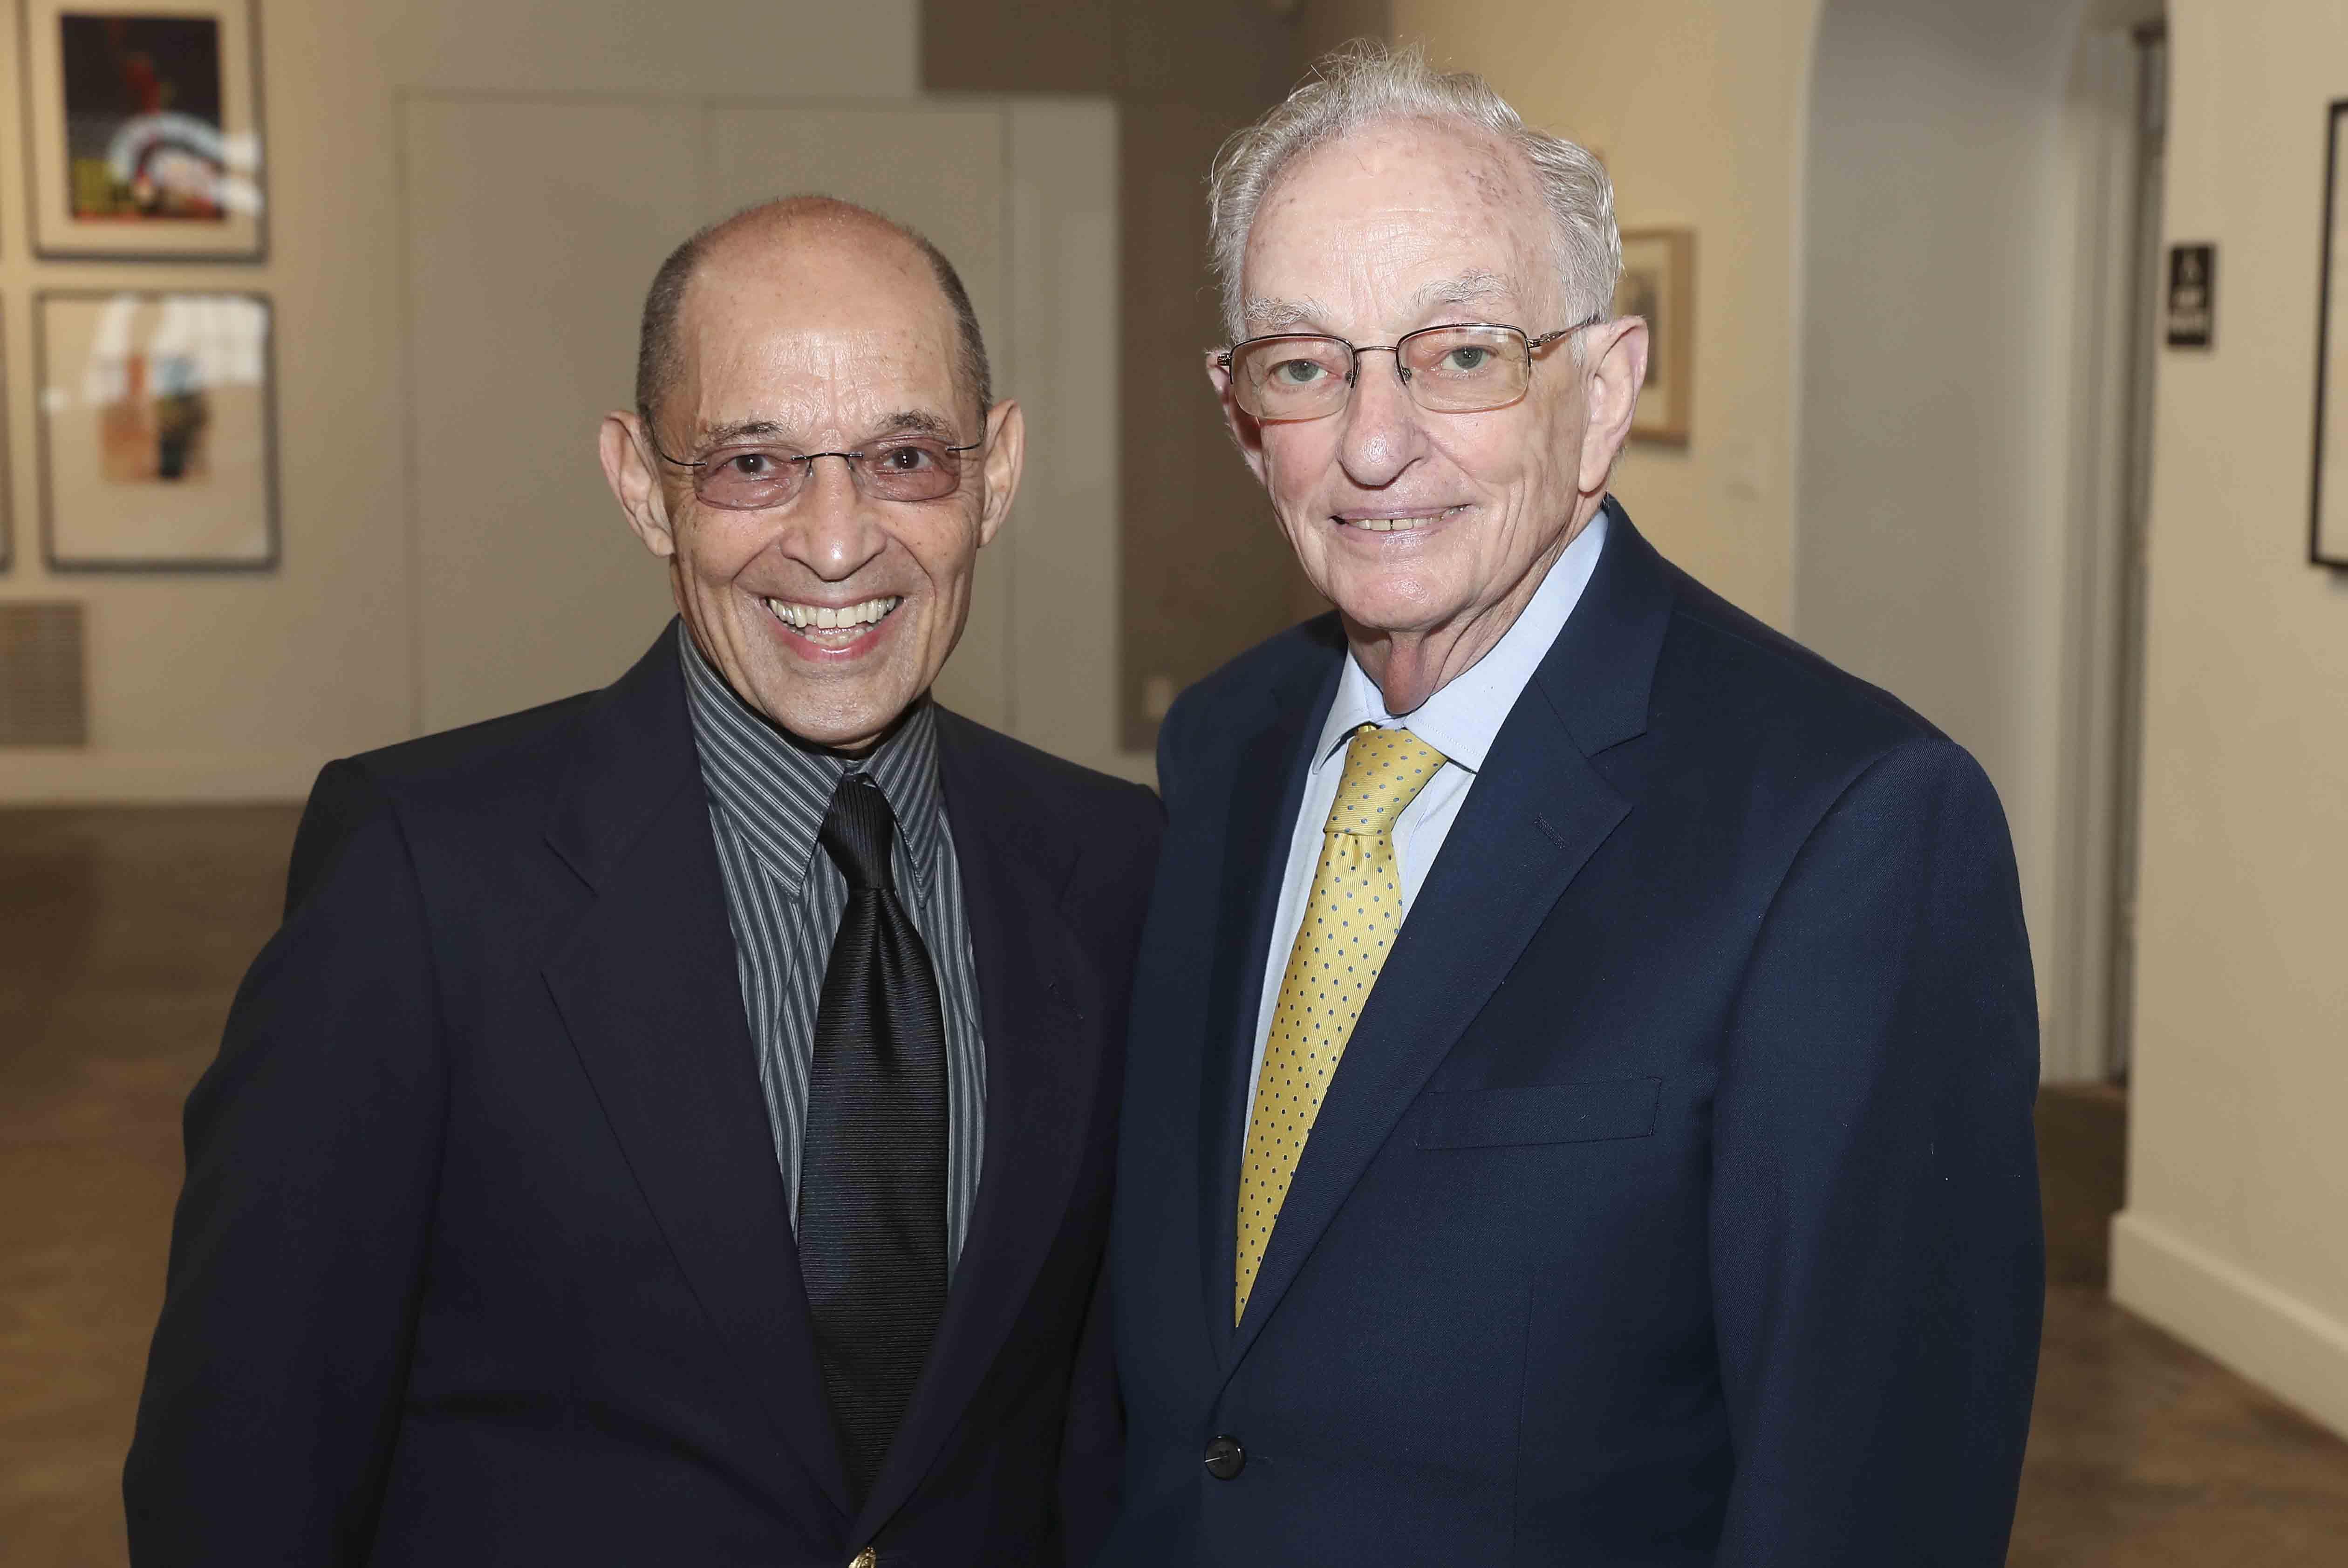 Gerald Sorin and Rabbi Hillel Cohn